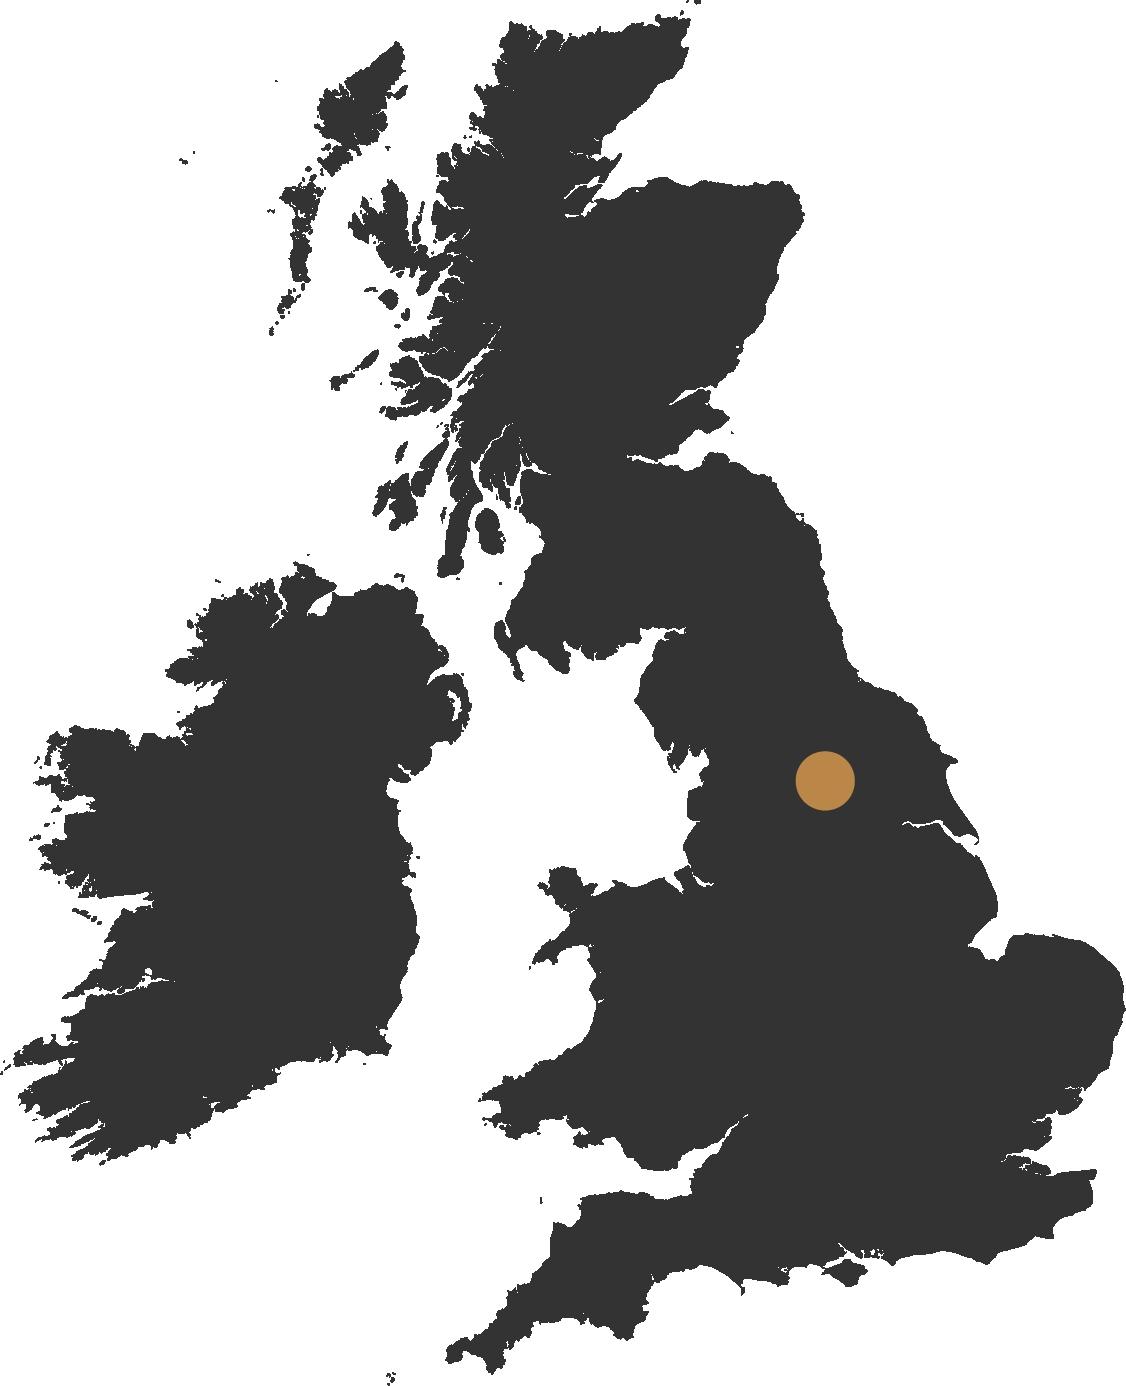 map of the uk showing harrogate